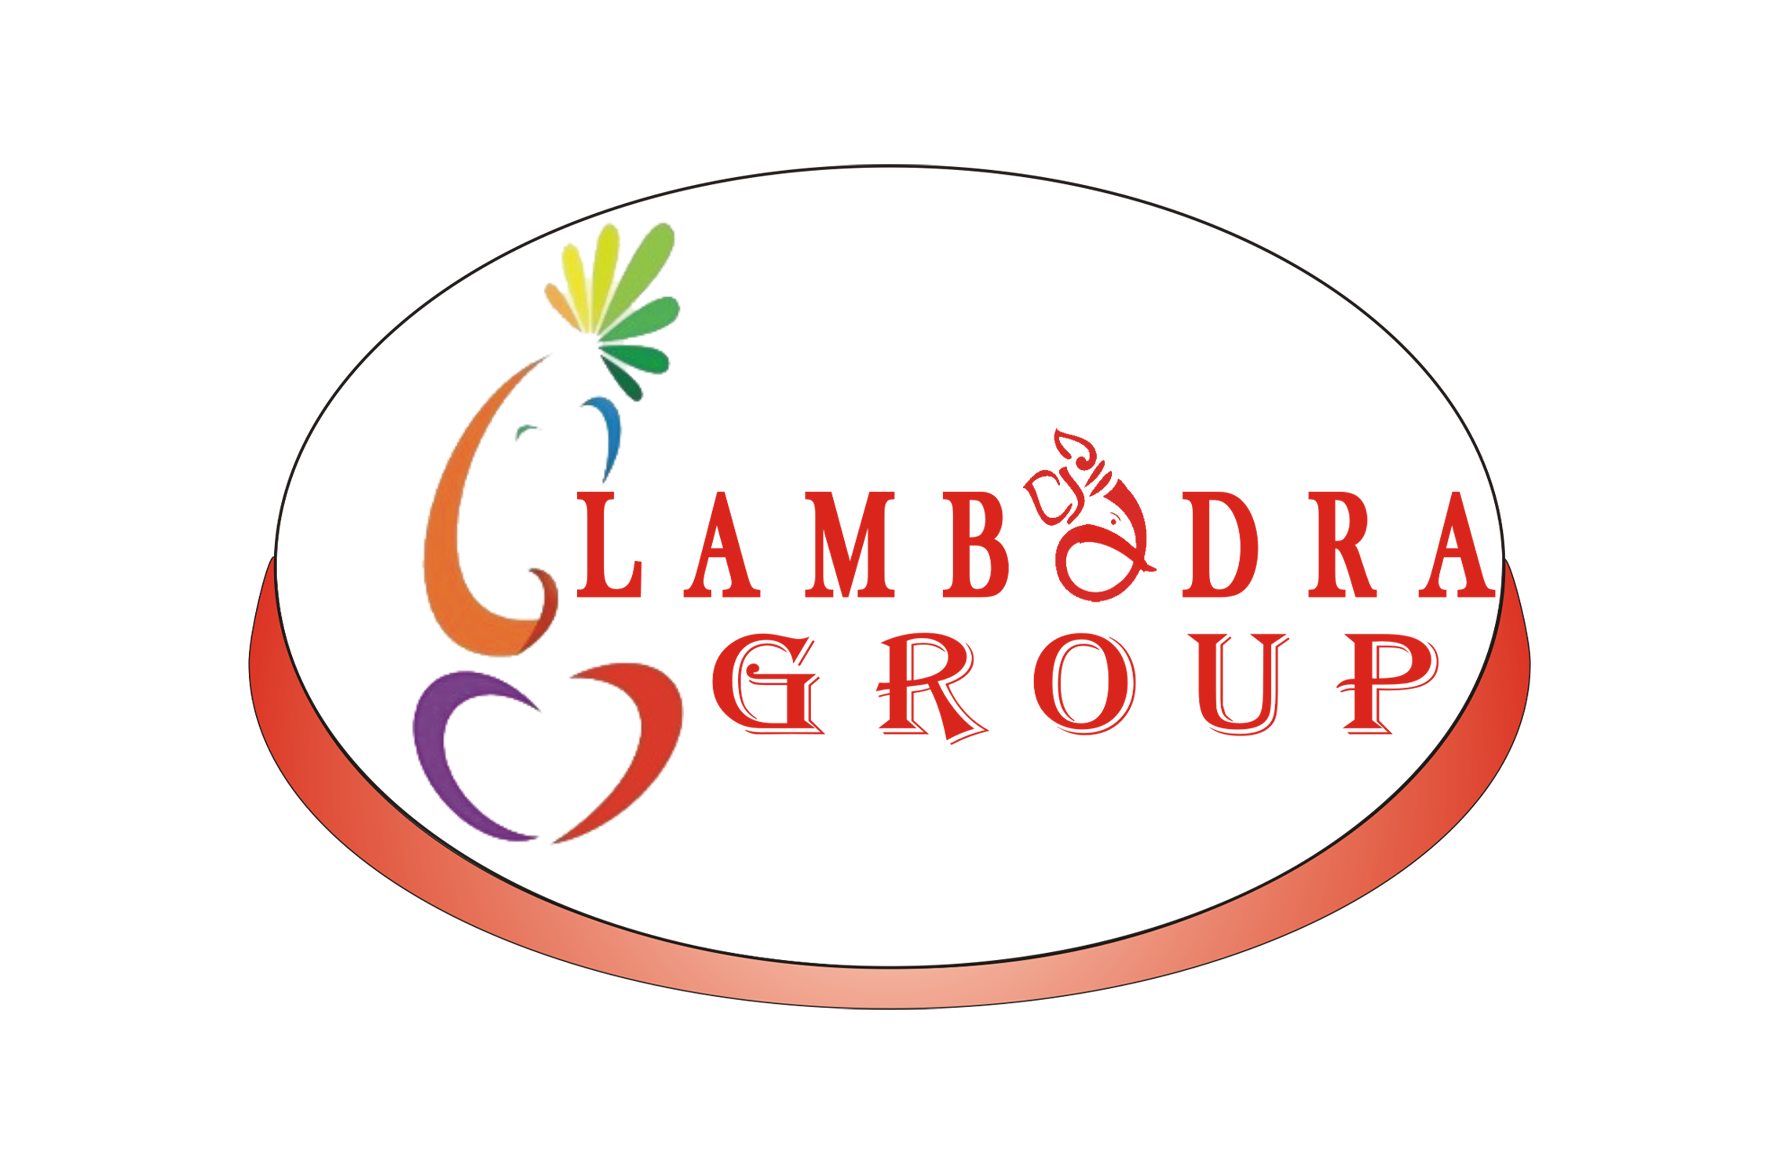 Lambodra Group